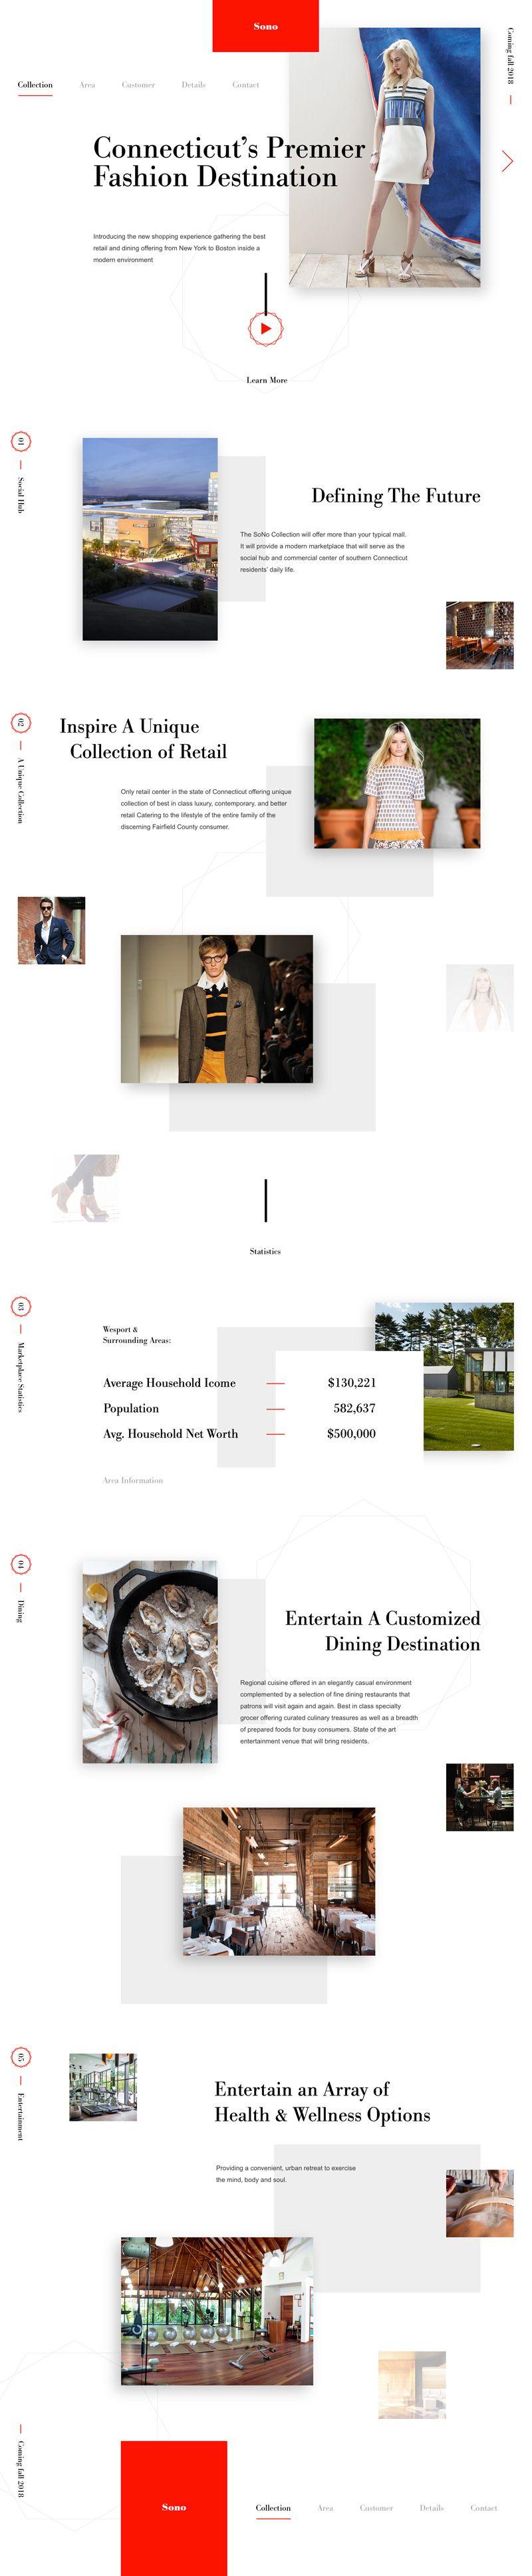 Sono Concept Minimal and Elegant Fashion Website